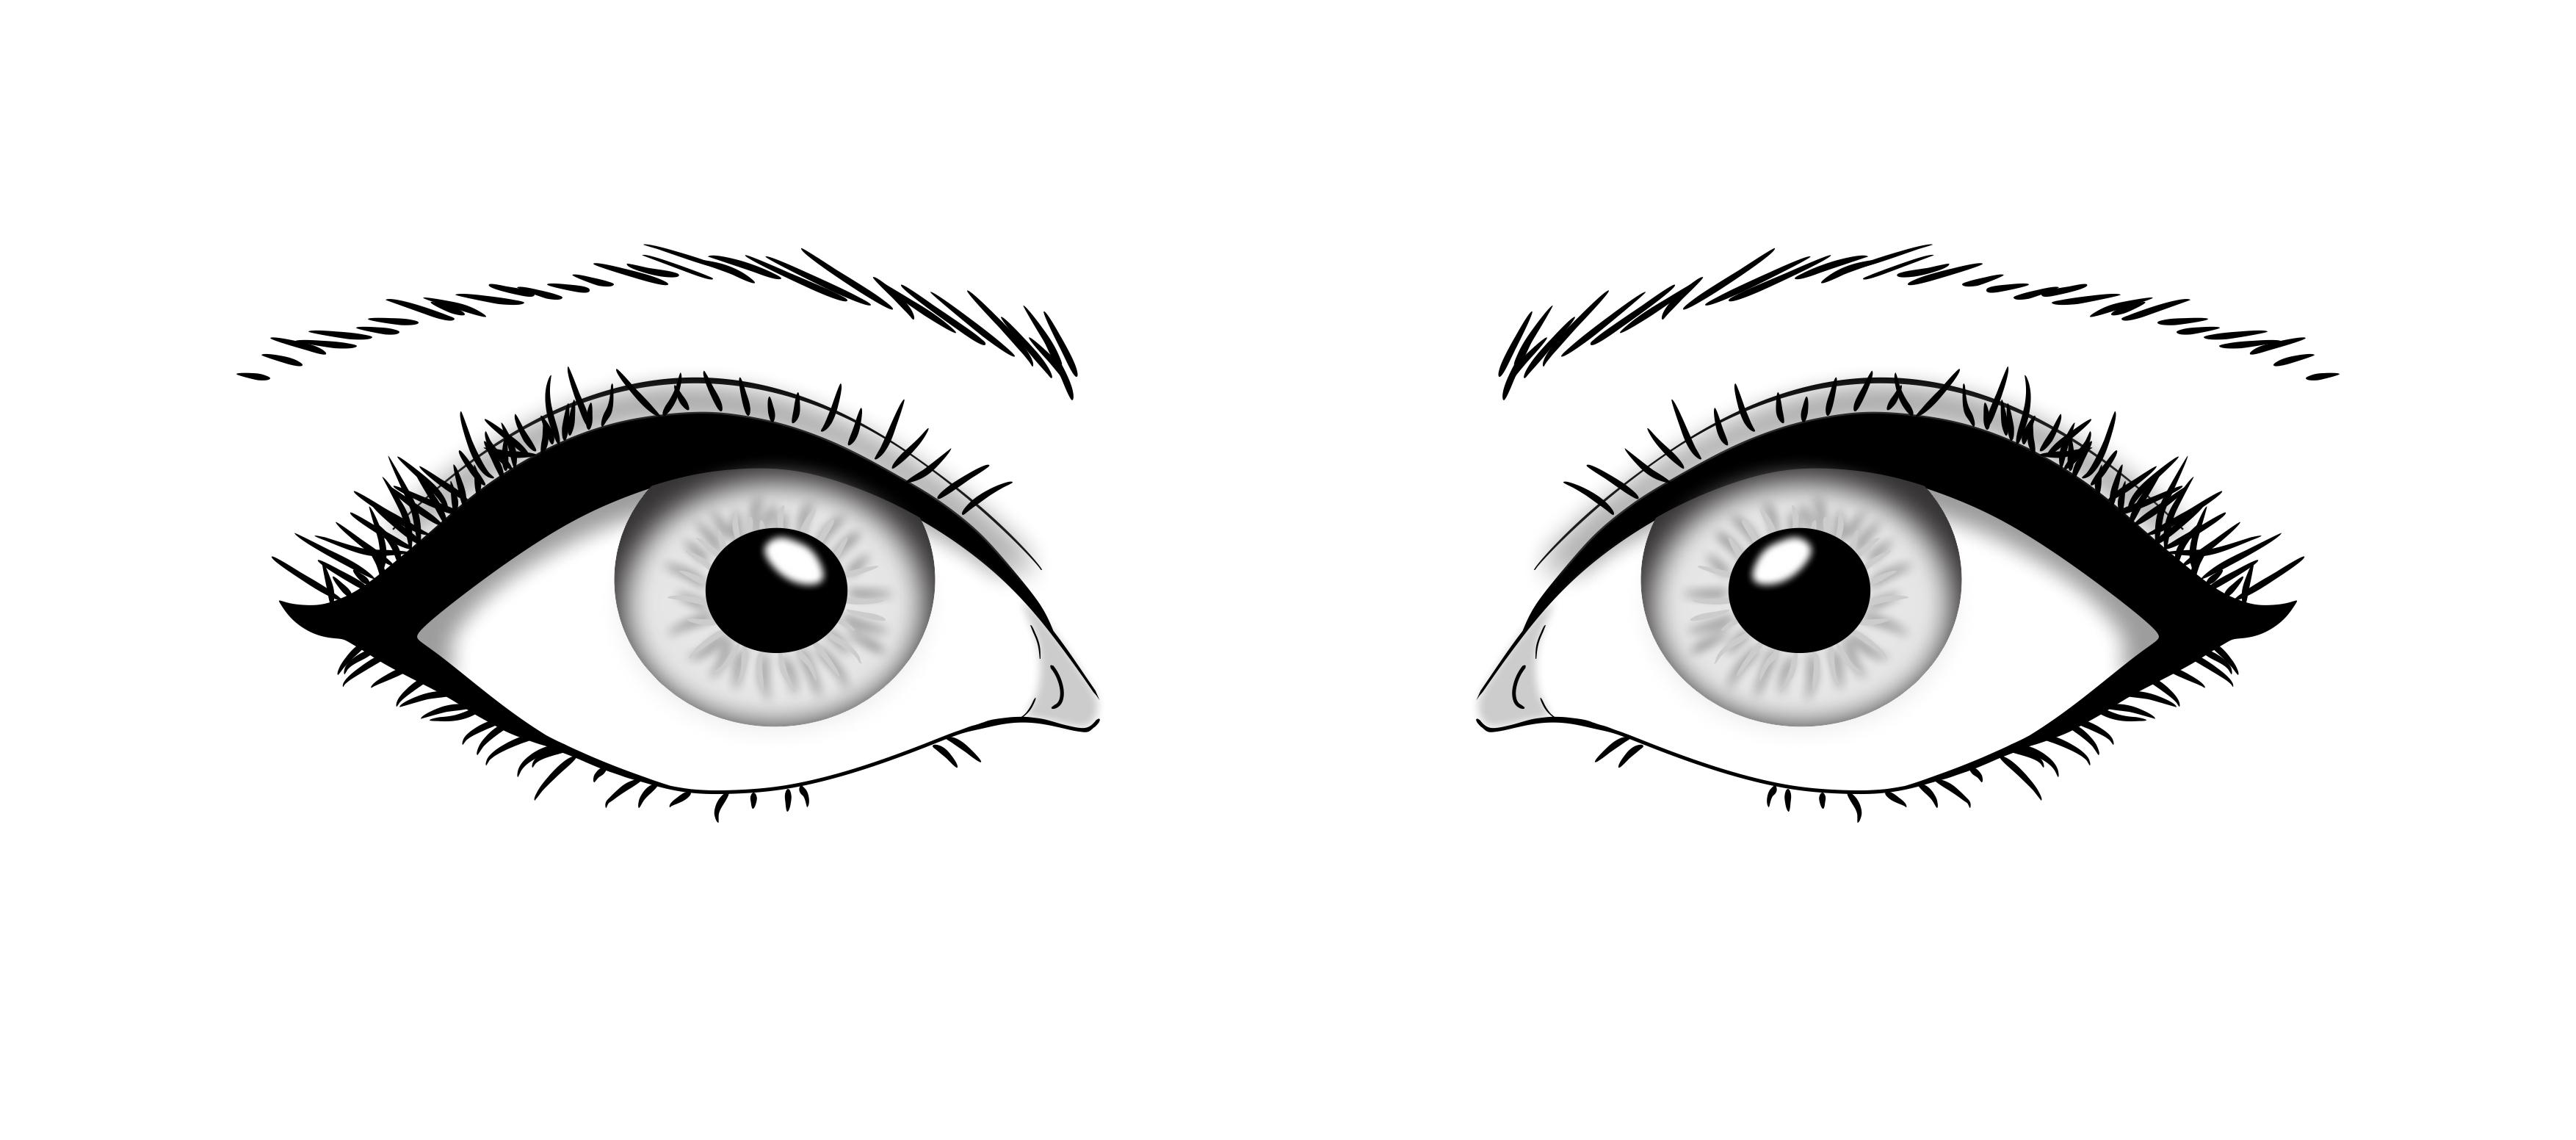 Eyes Vector By Saigolp On Deviantart